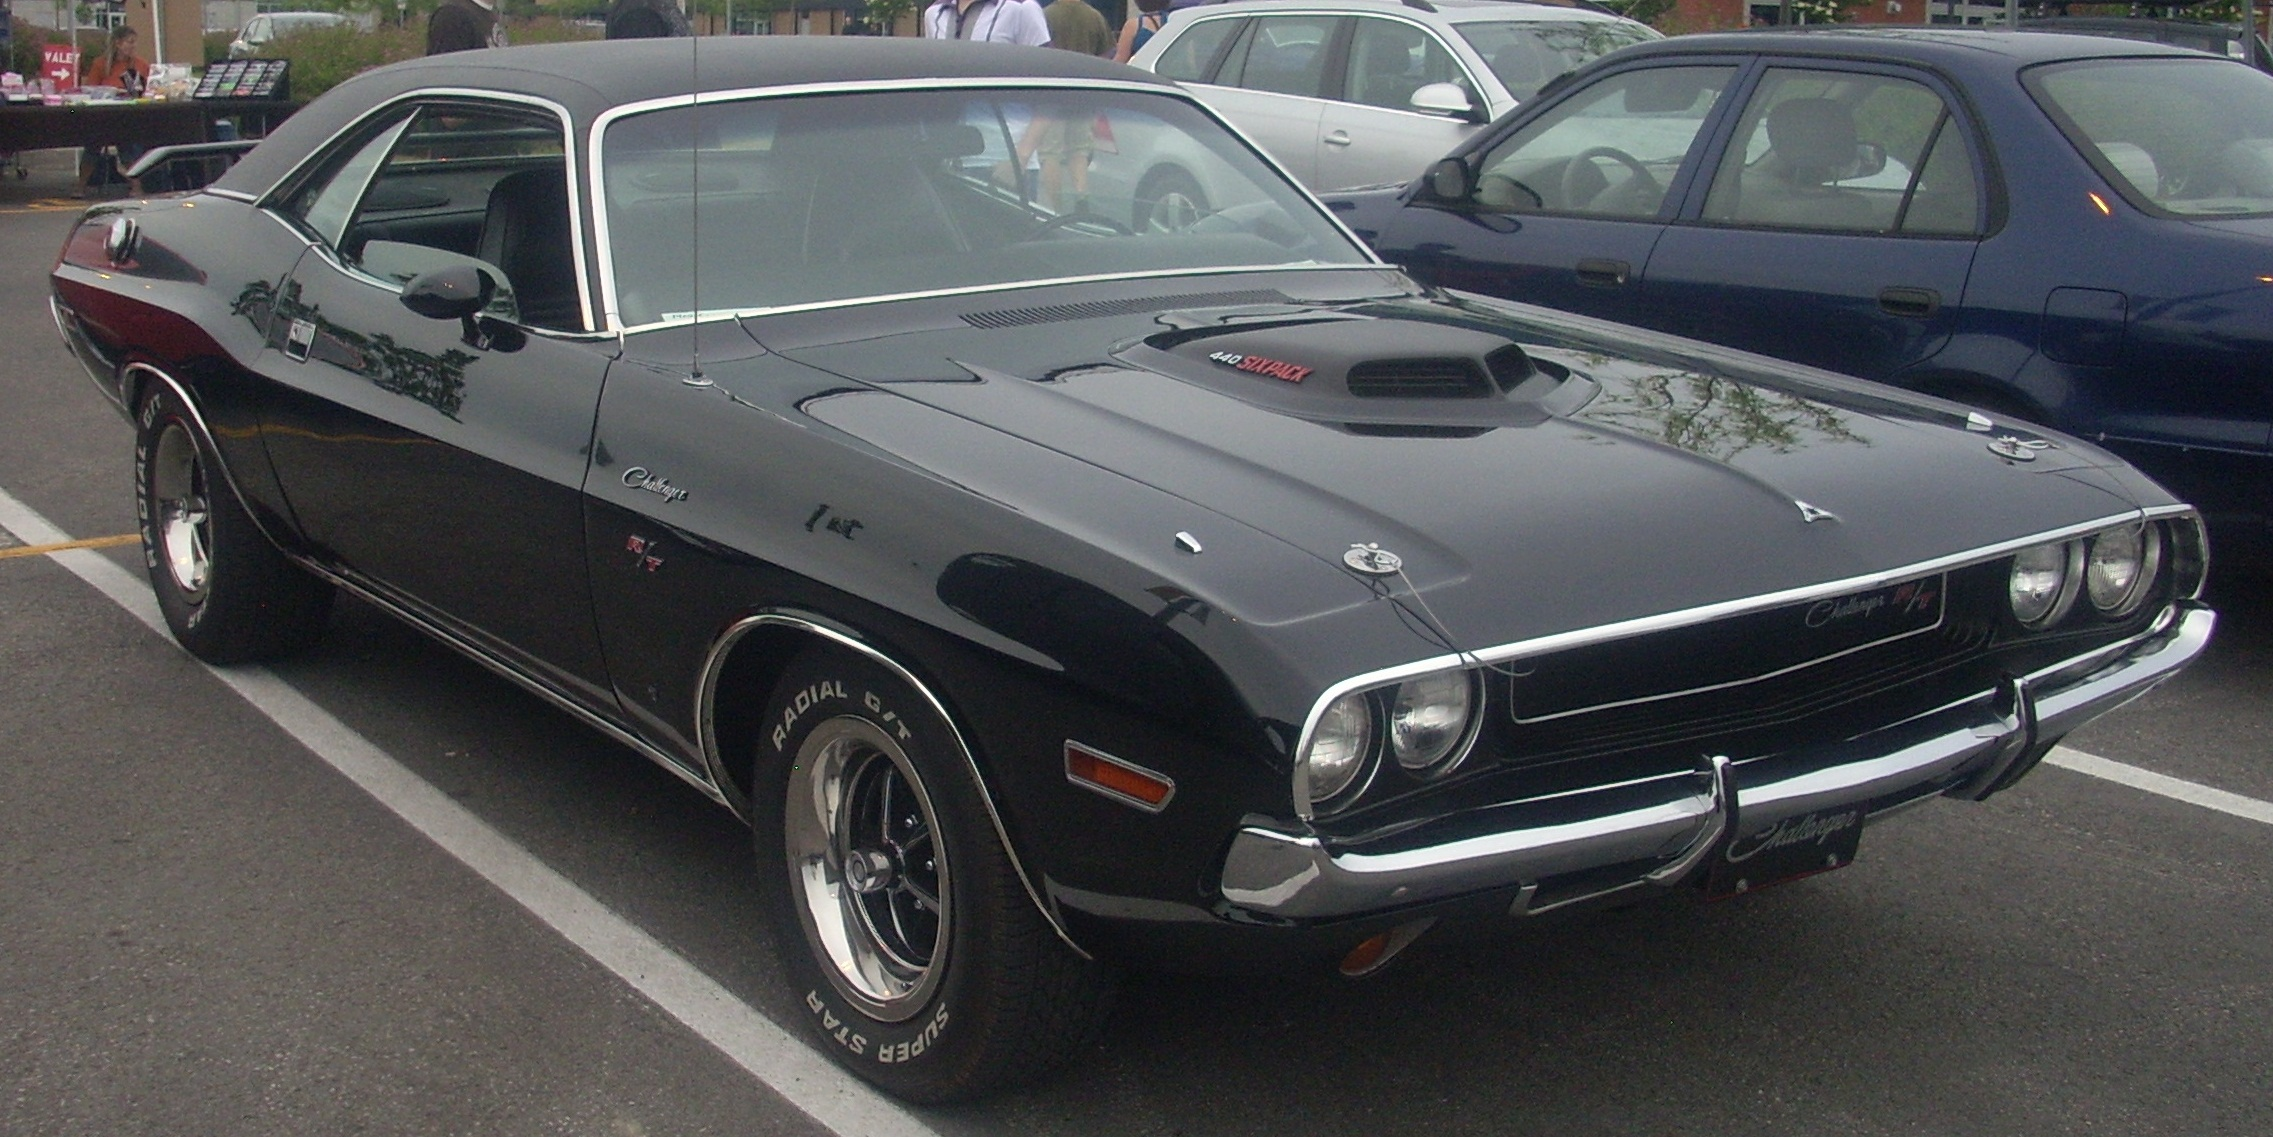 Srt Dodge Dart >> File:'70 Dodge Challenger R-T (Centropolis Laval '10).jpg - Wikimedia Commons